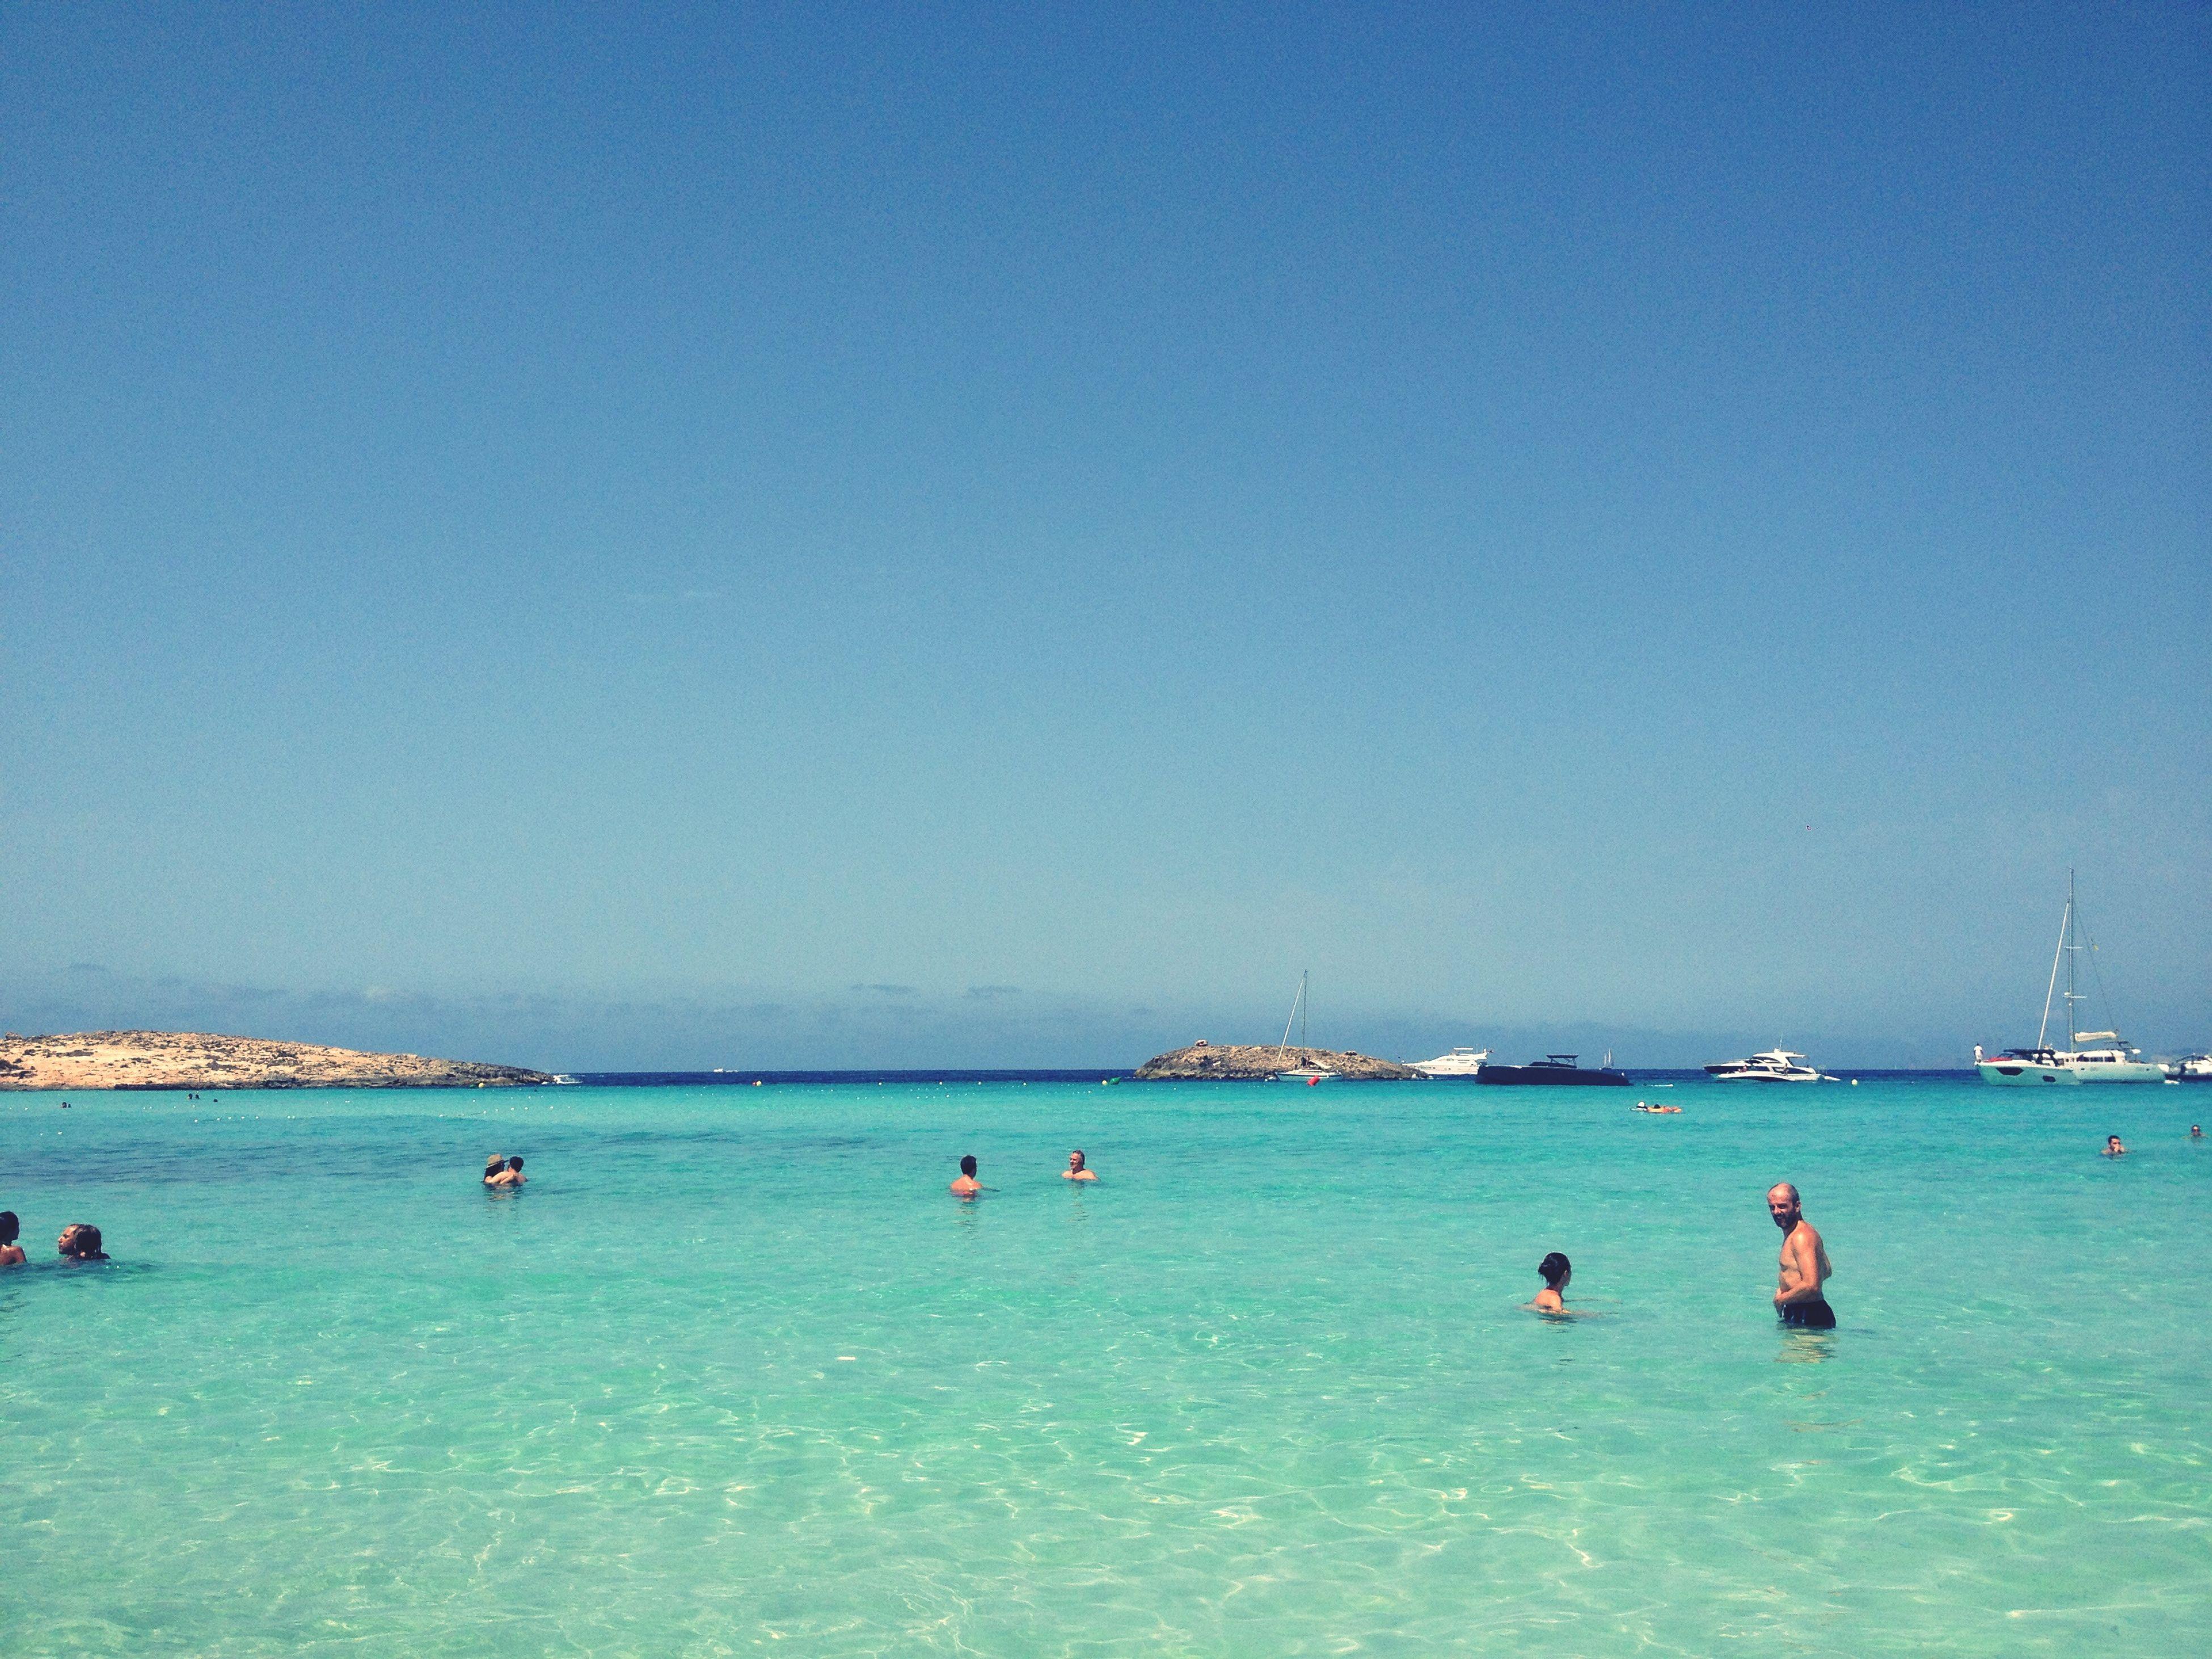 Taking Photos Hello World Enjoying Life Hi! Relaxing Vacation Formentera Baleares Platja Spain♥